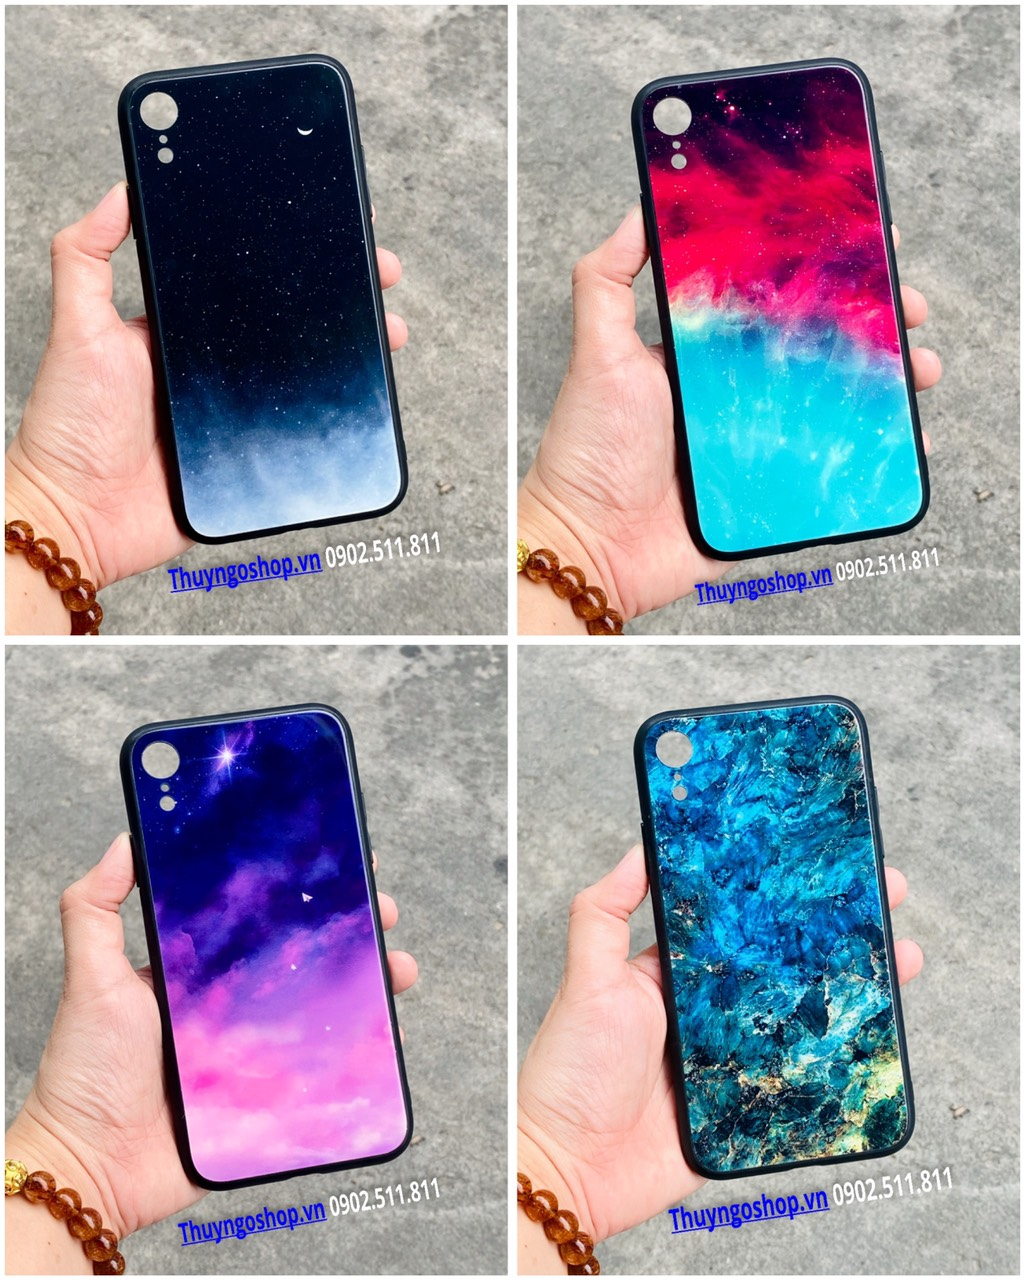 Ốp lưng kính màu loang Iphone 12 mini / 12 / 12 Pro / 11 Pro Max / 11 / 11 Pro / Xs Max / XR / X /Xs/7/8/ 7plus / 8 plus